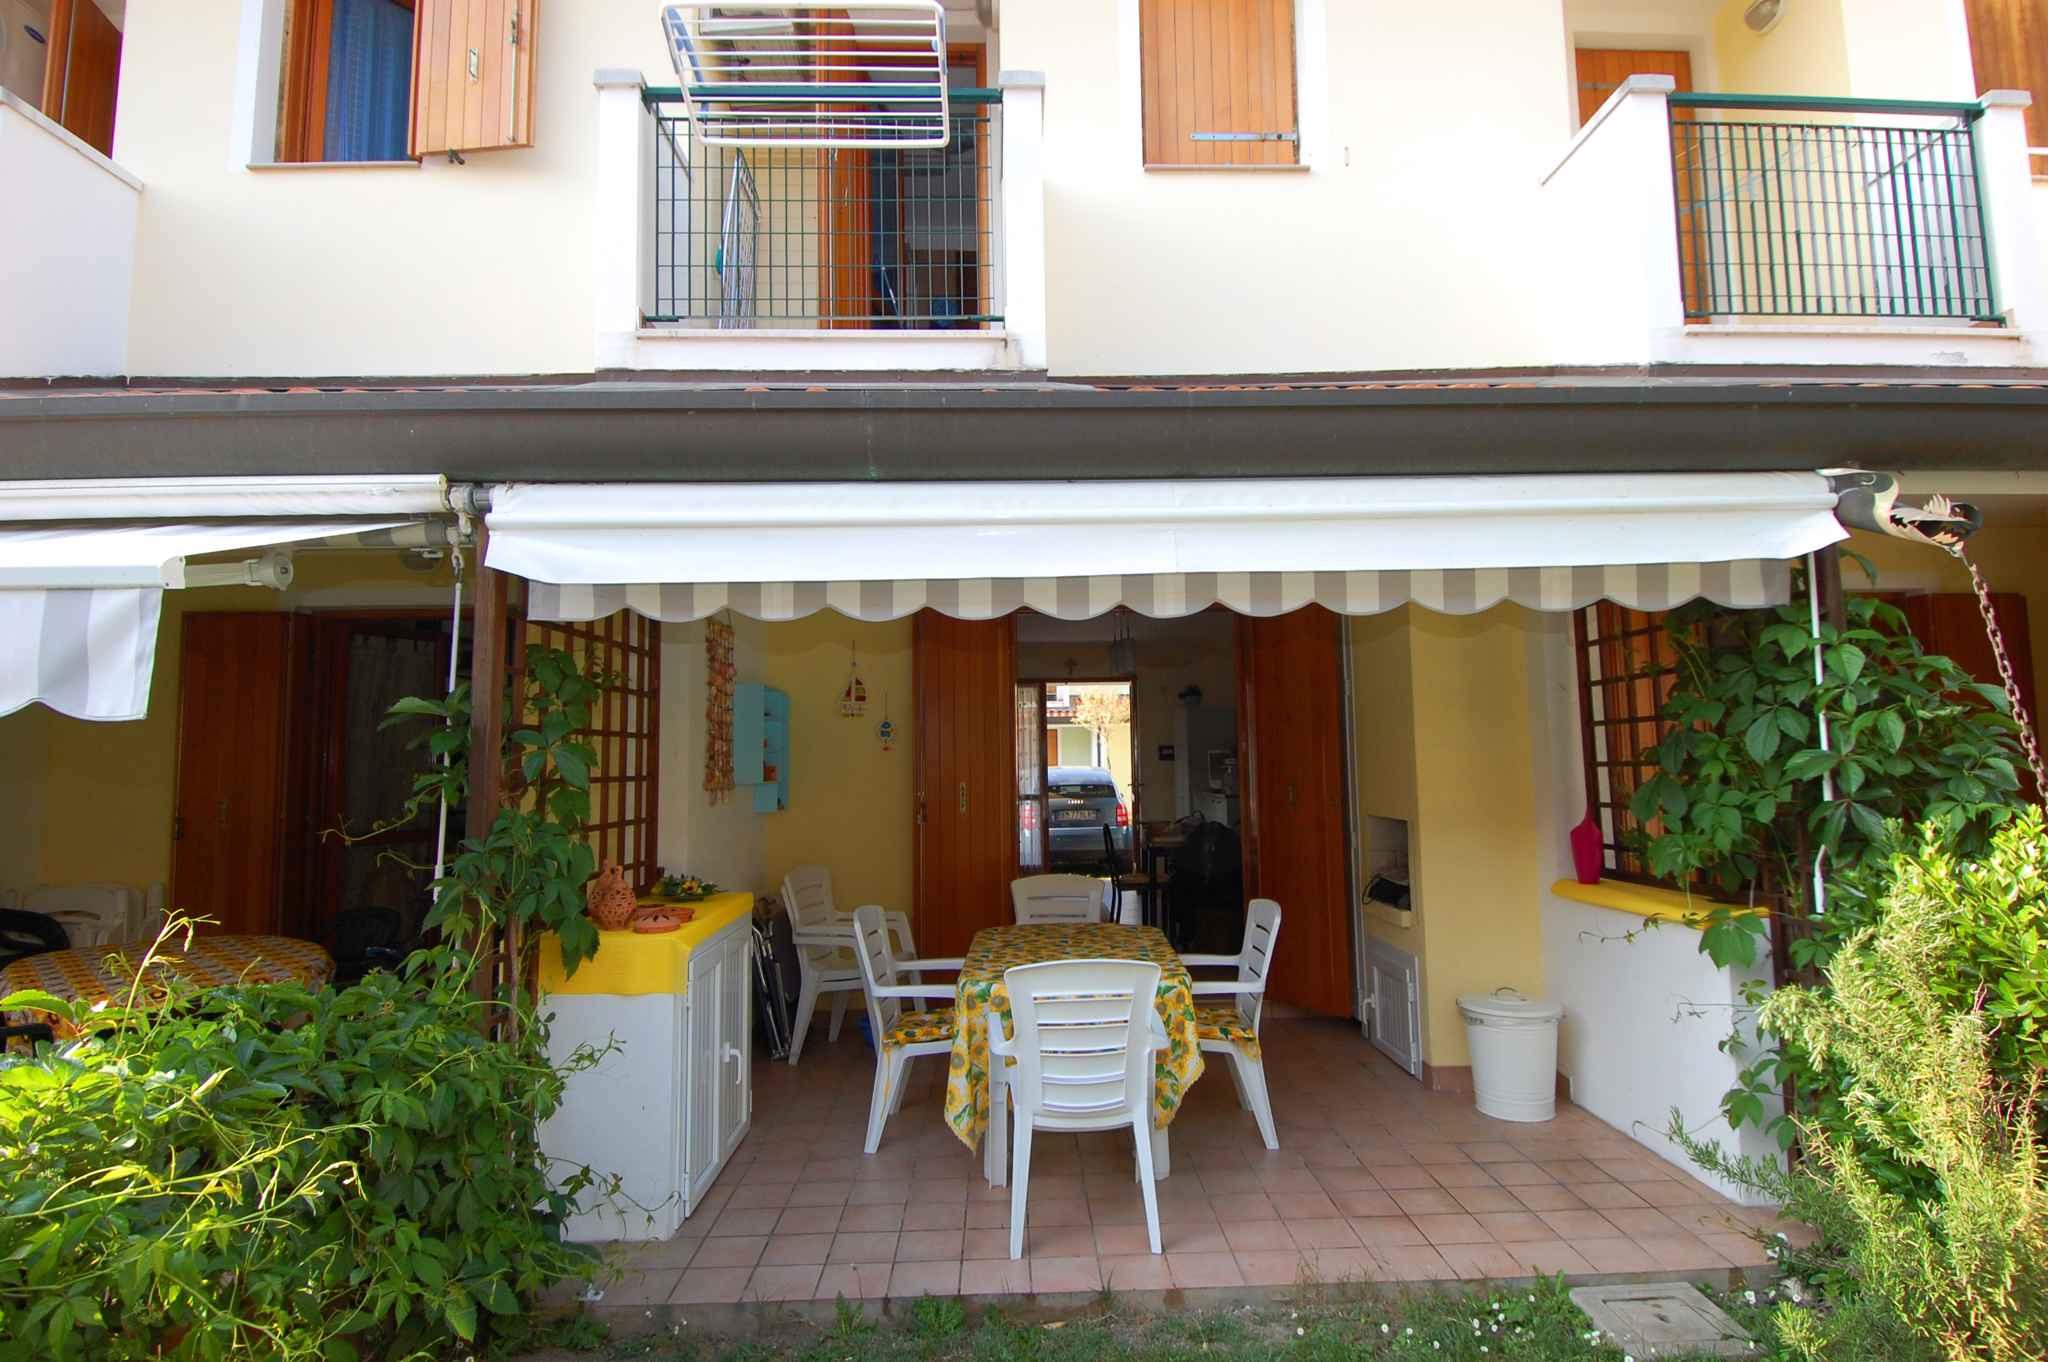 Ferienhaus mit Pool und Grill (284304), Rosolina Mare, Rovigo, Venetien, Italien, Bild 7